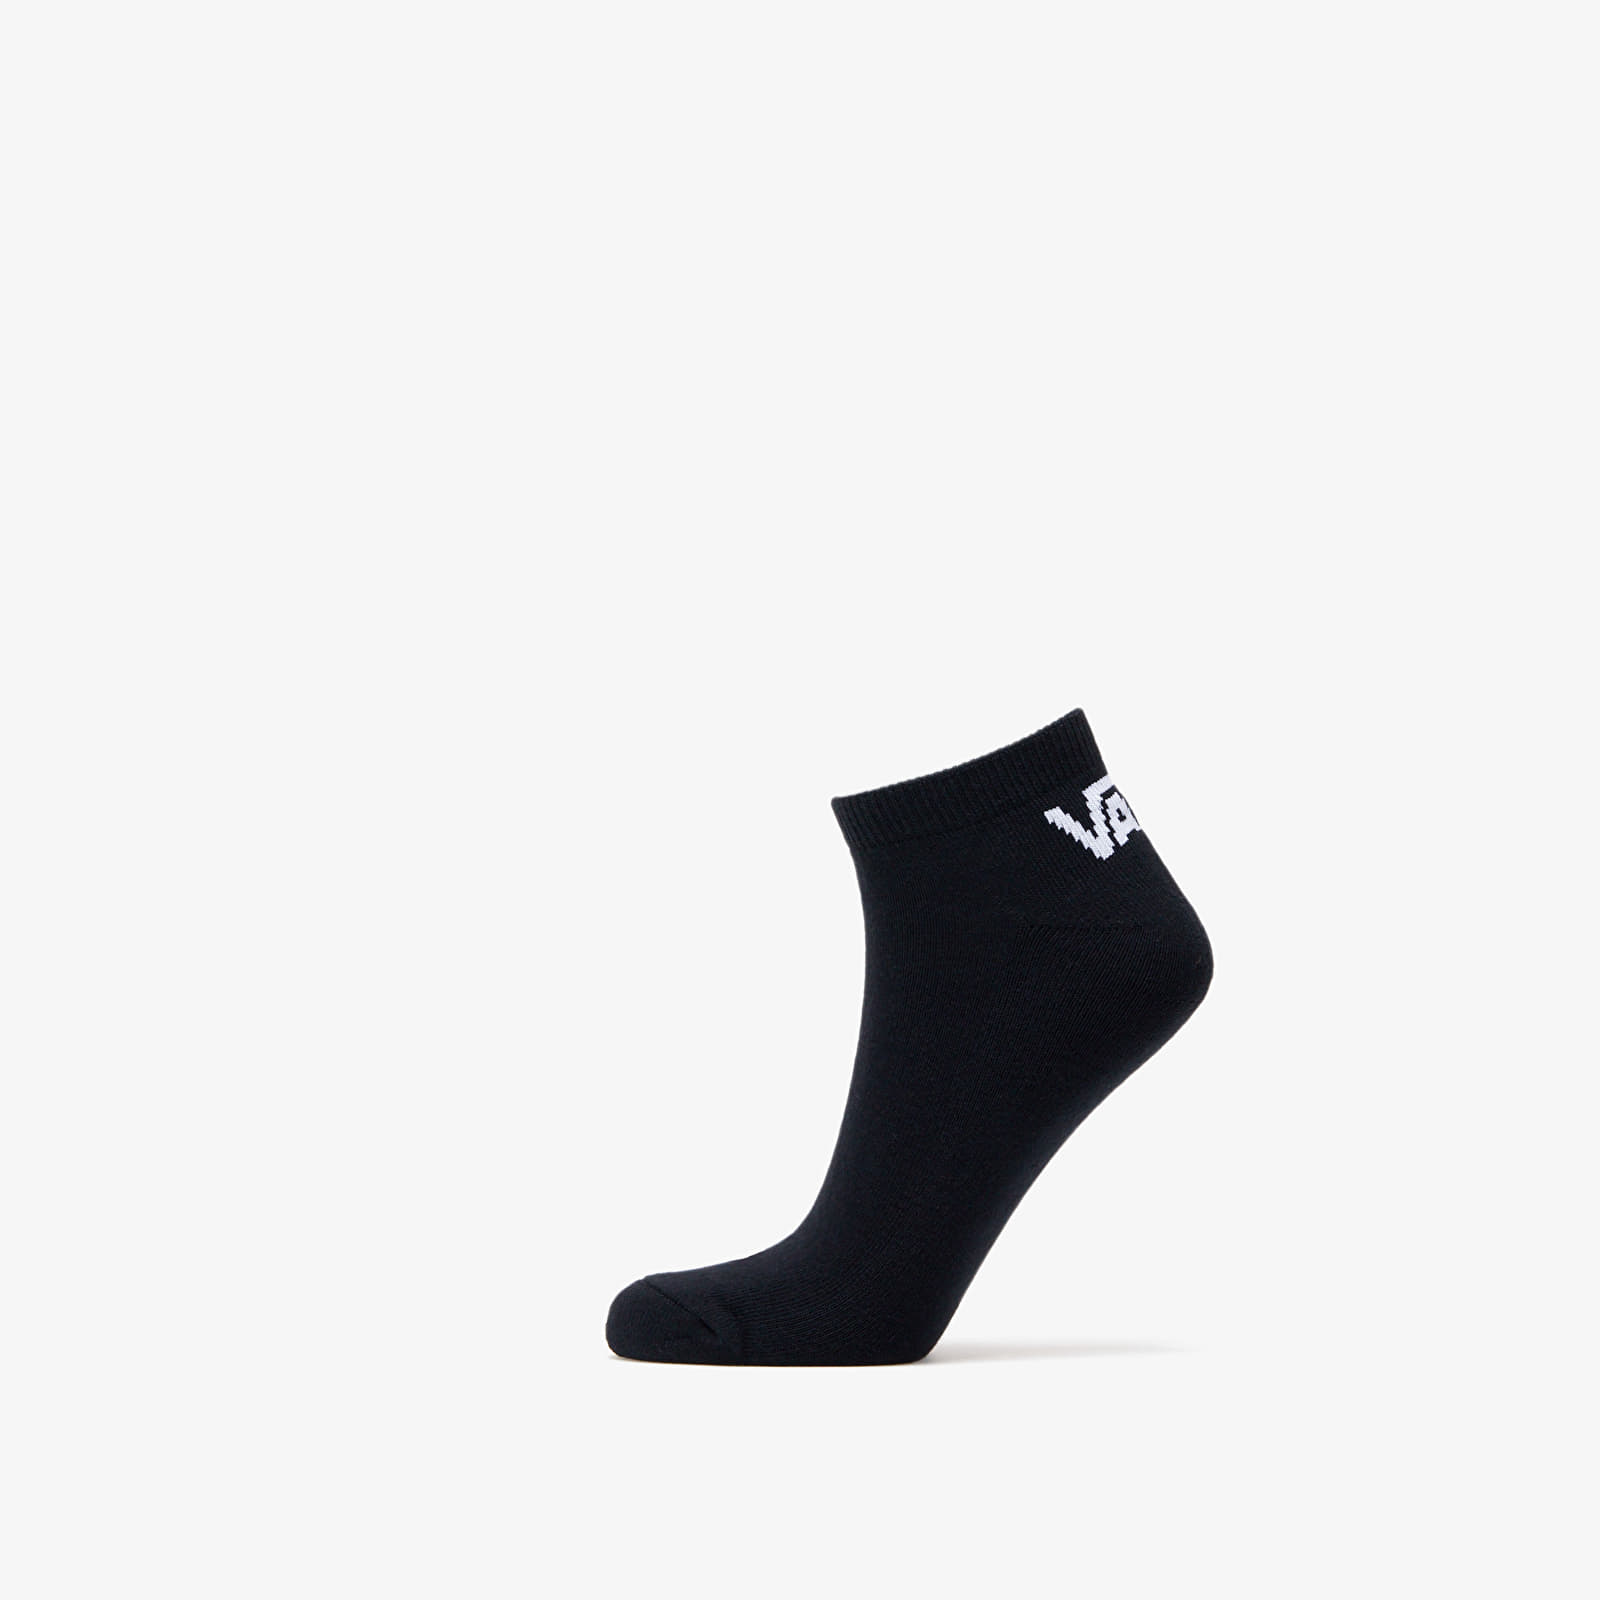 Vans Classic Low 3 Pair Socks Black EUR 38.5-42